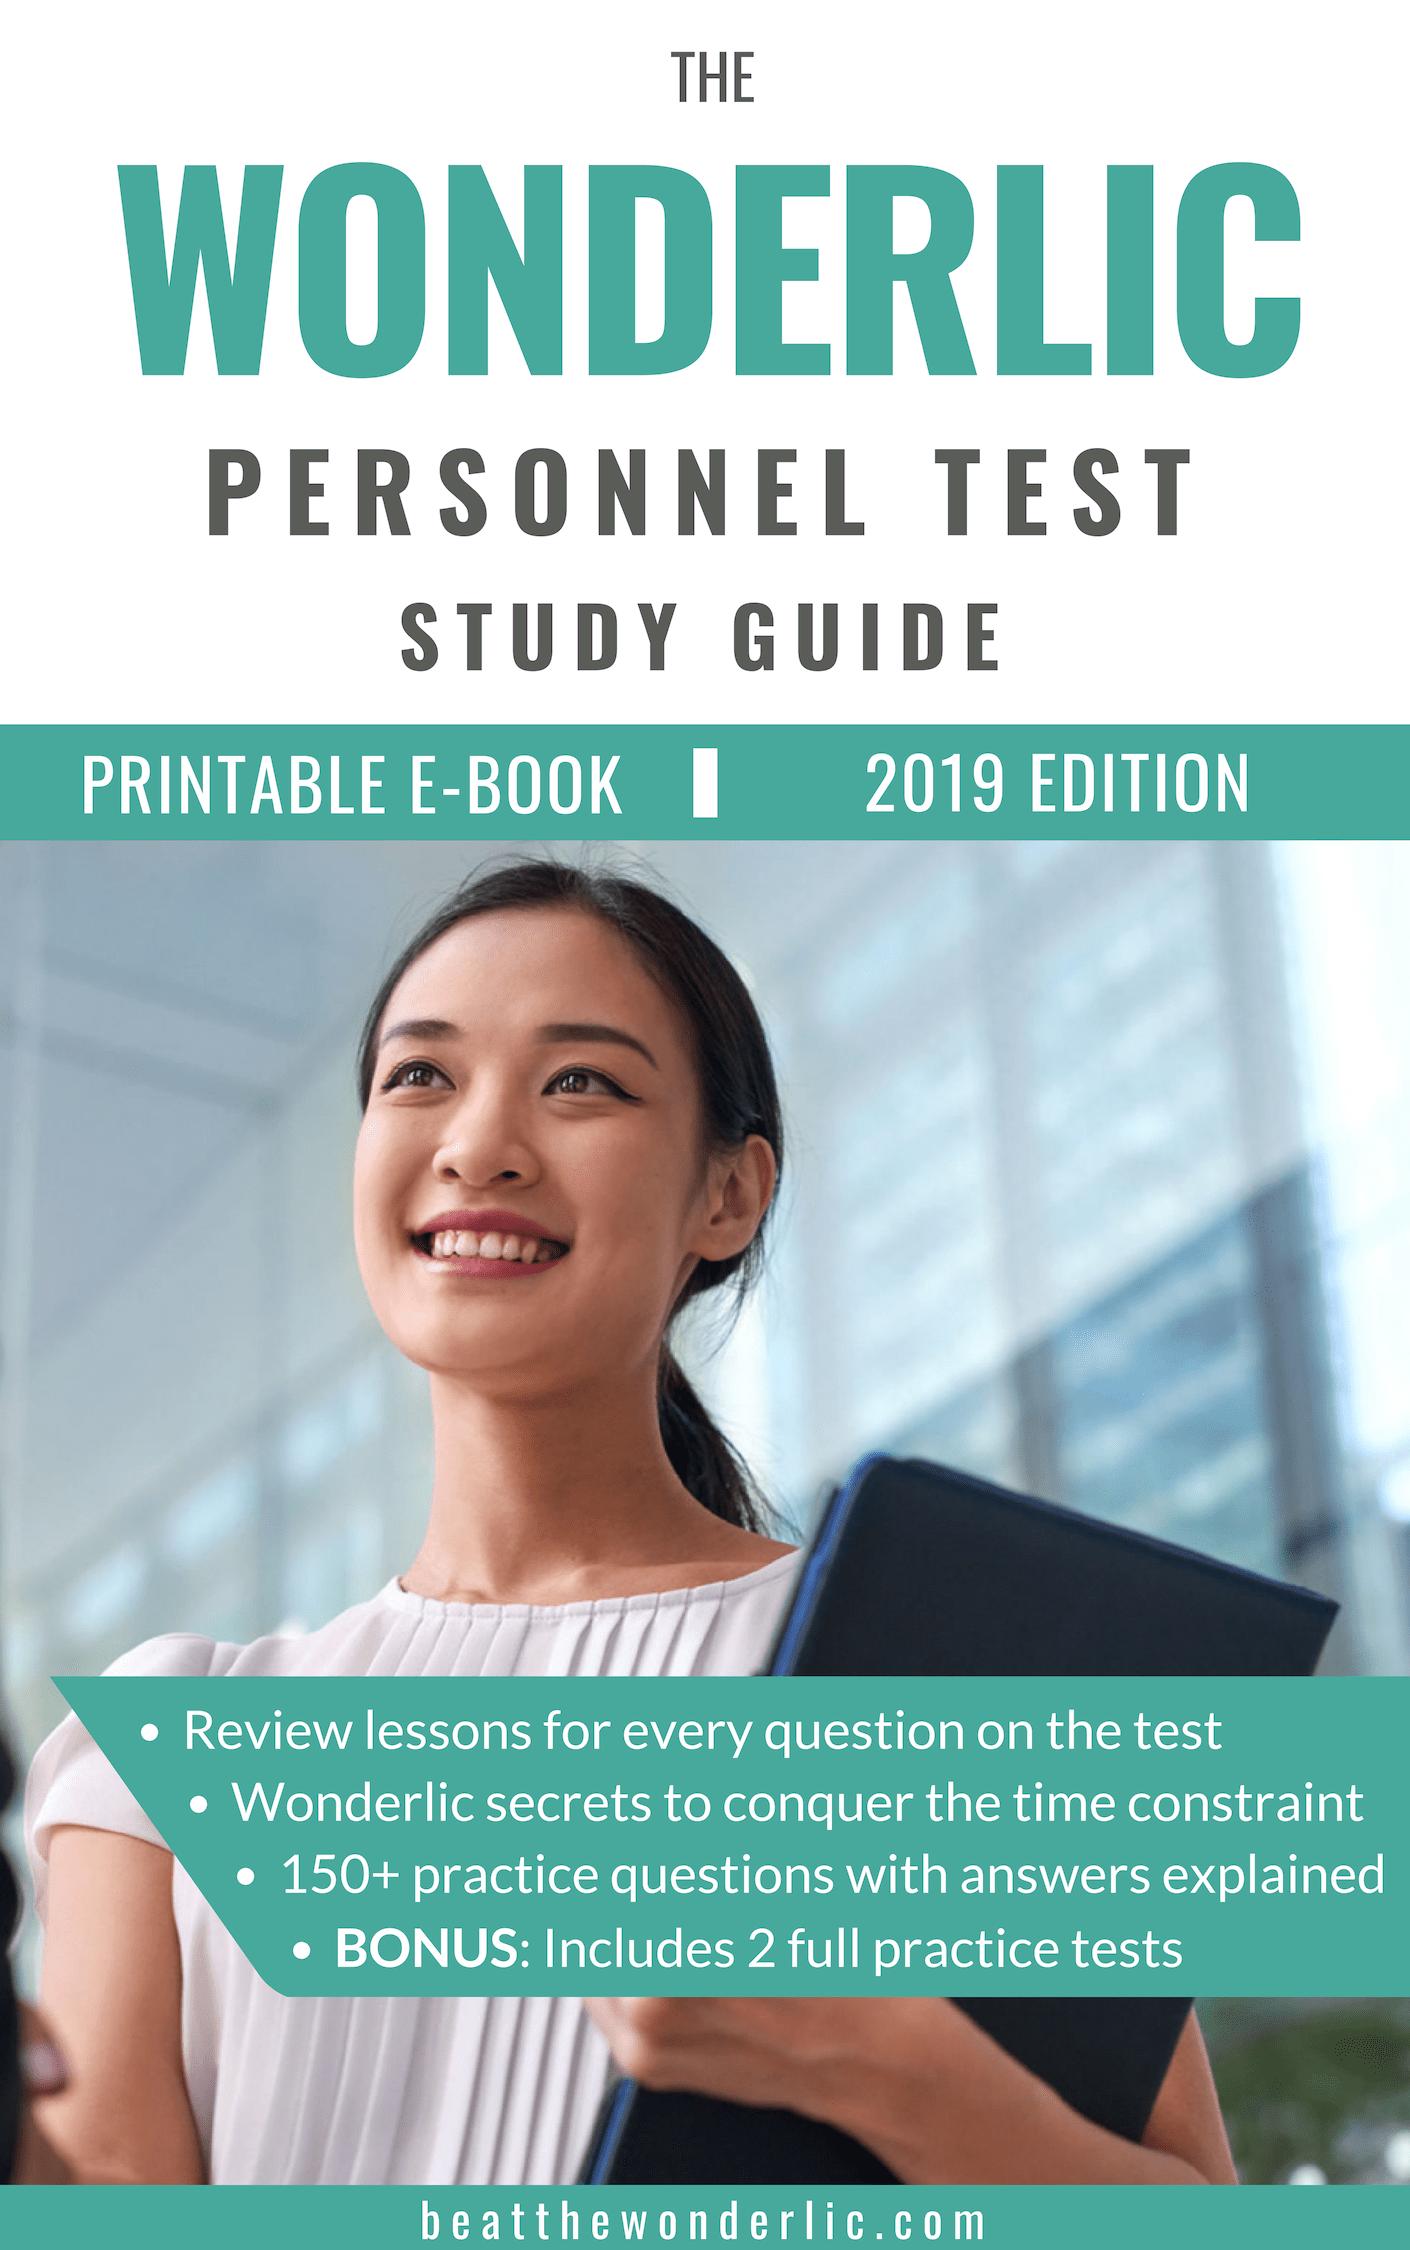 Wonderlic Personnel Test Study Guide